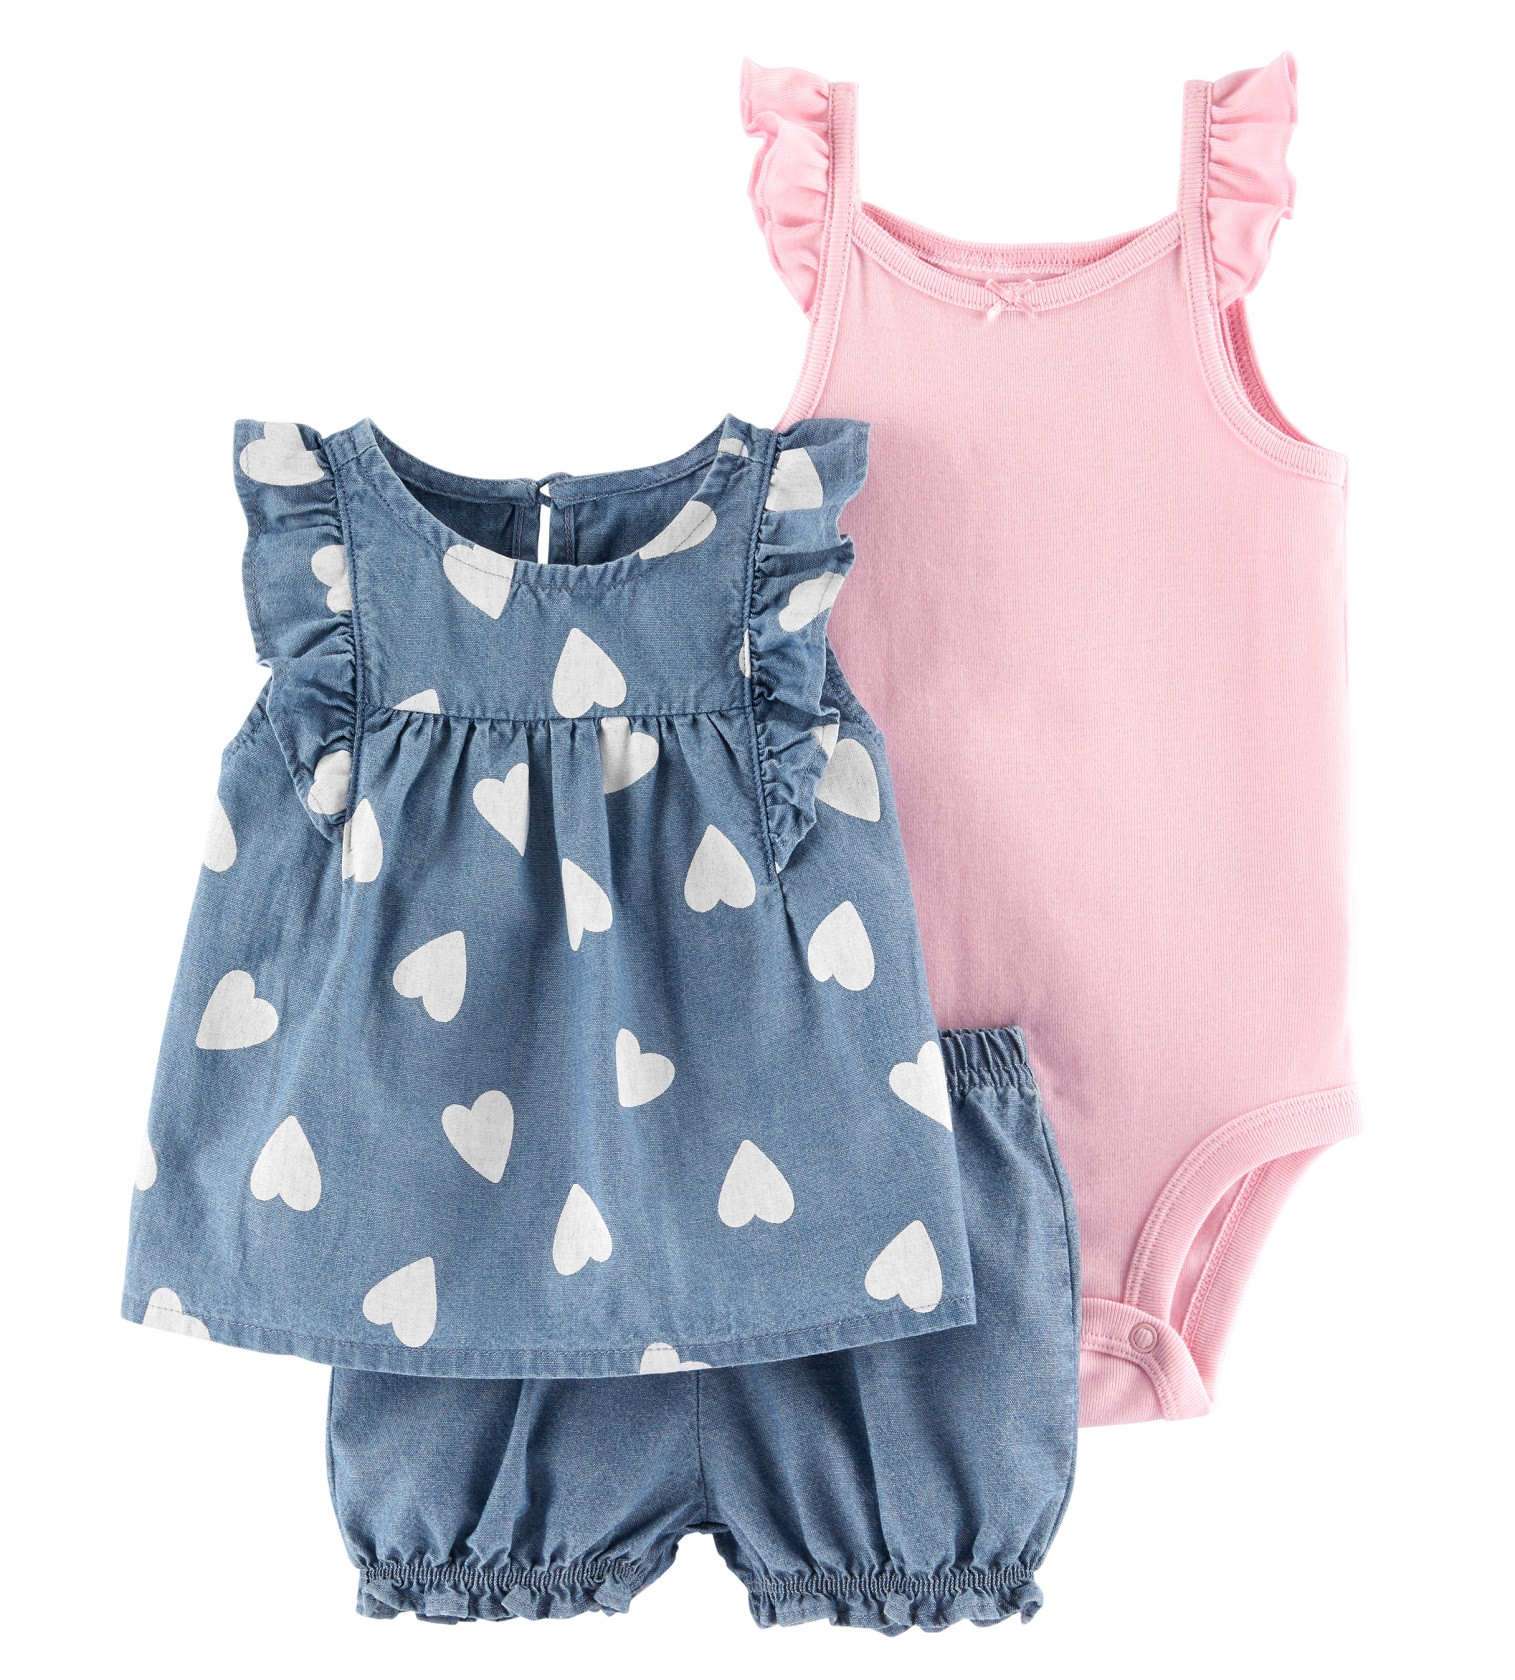 Купити Костюм 3в1 Carters Chambray Blue/Pink - фото 1